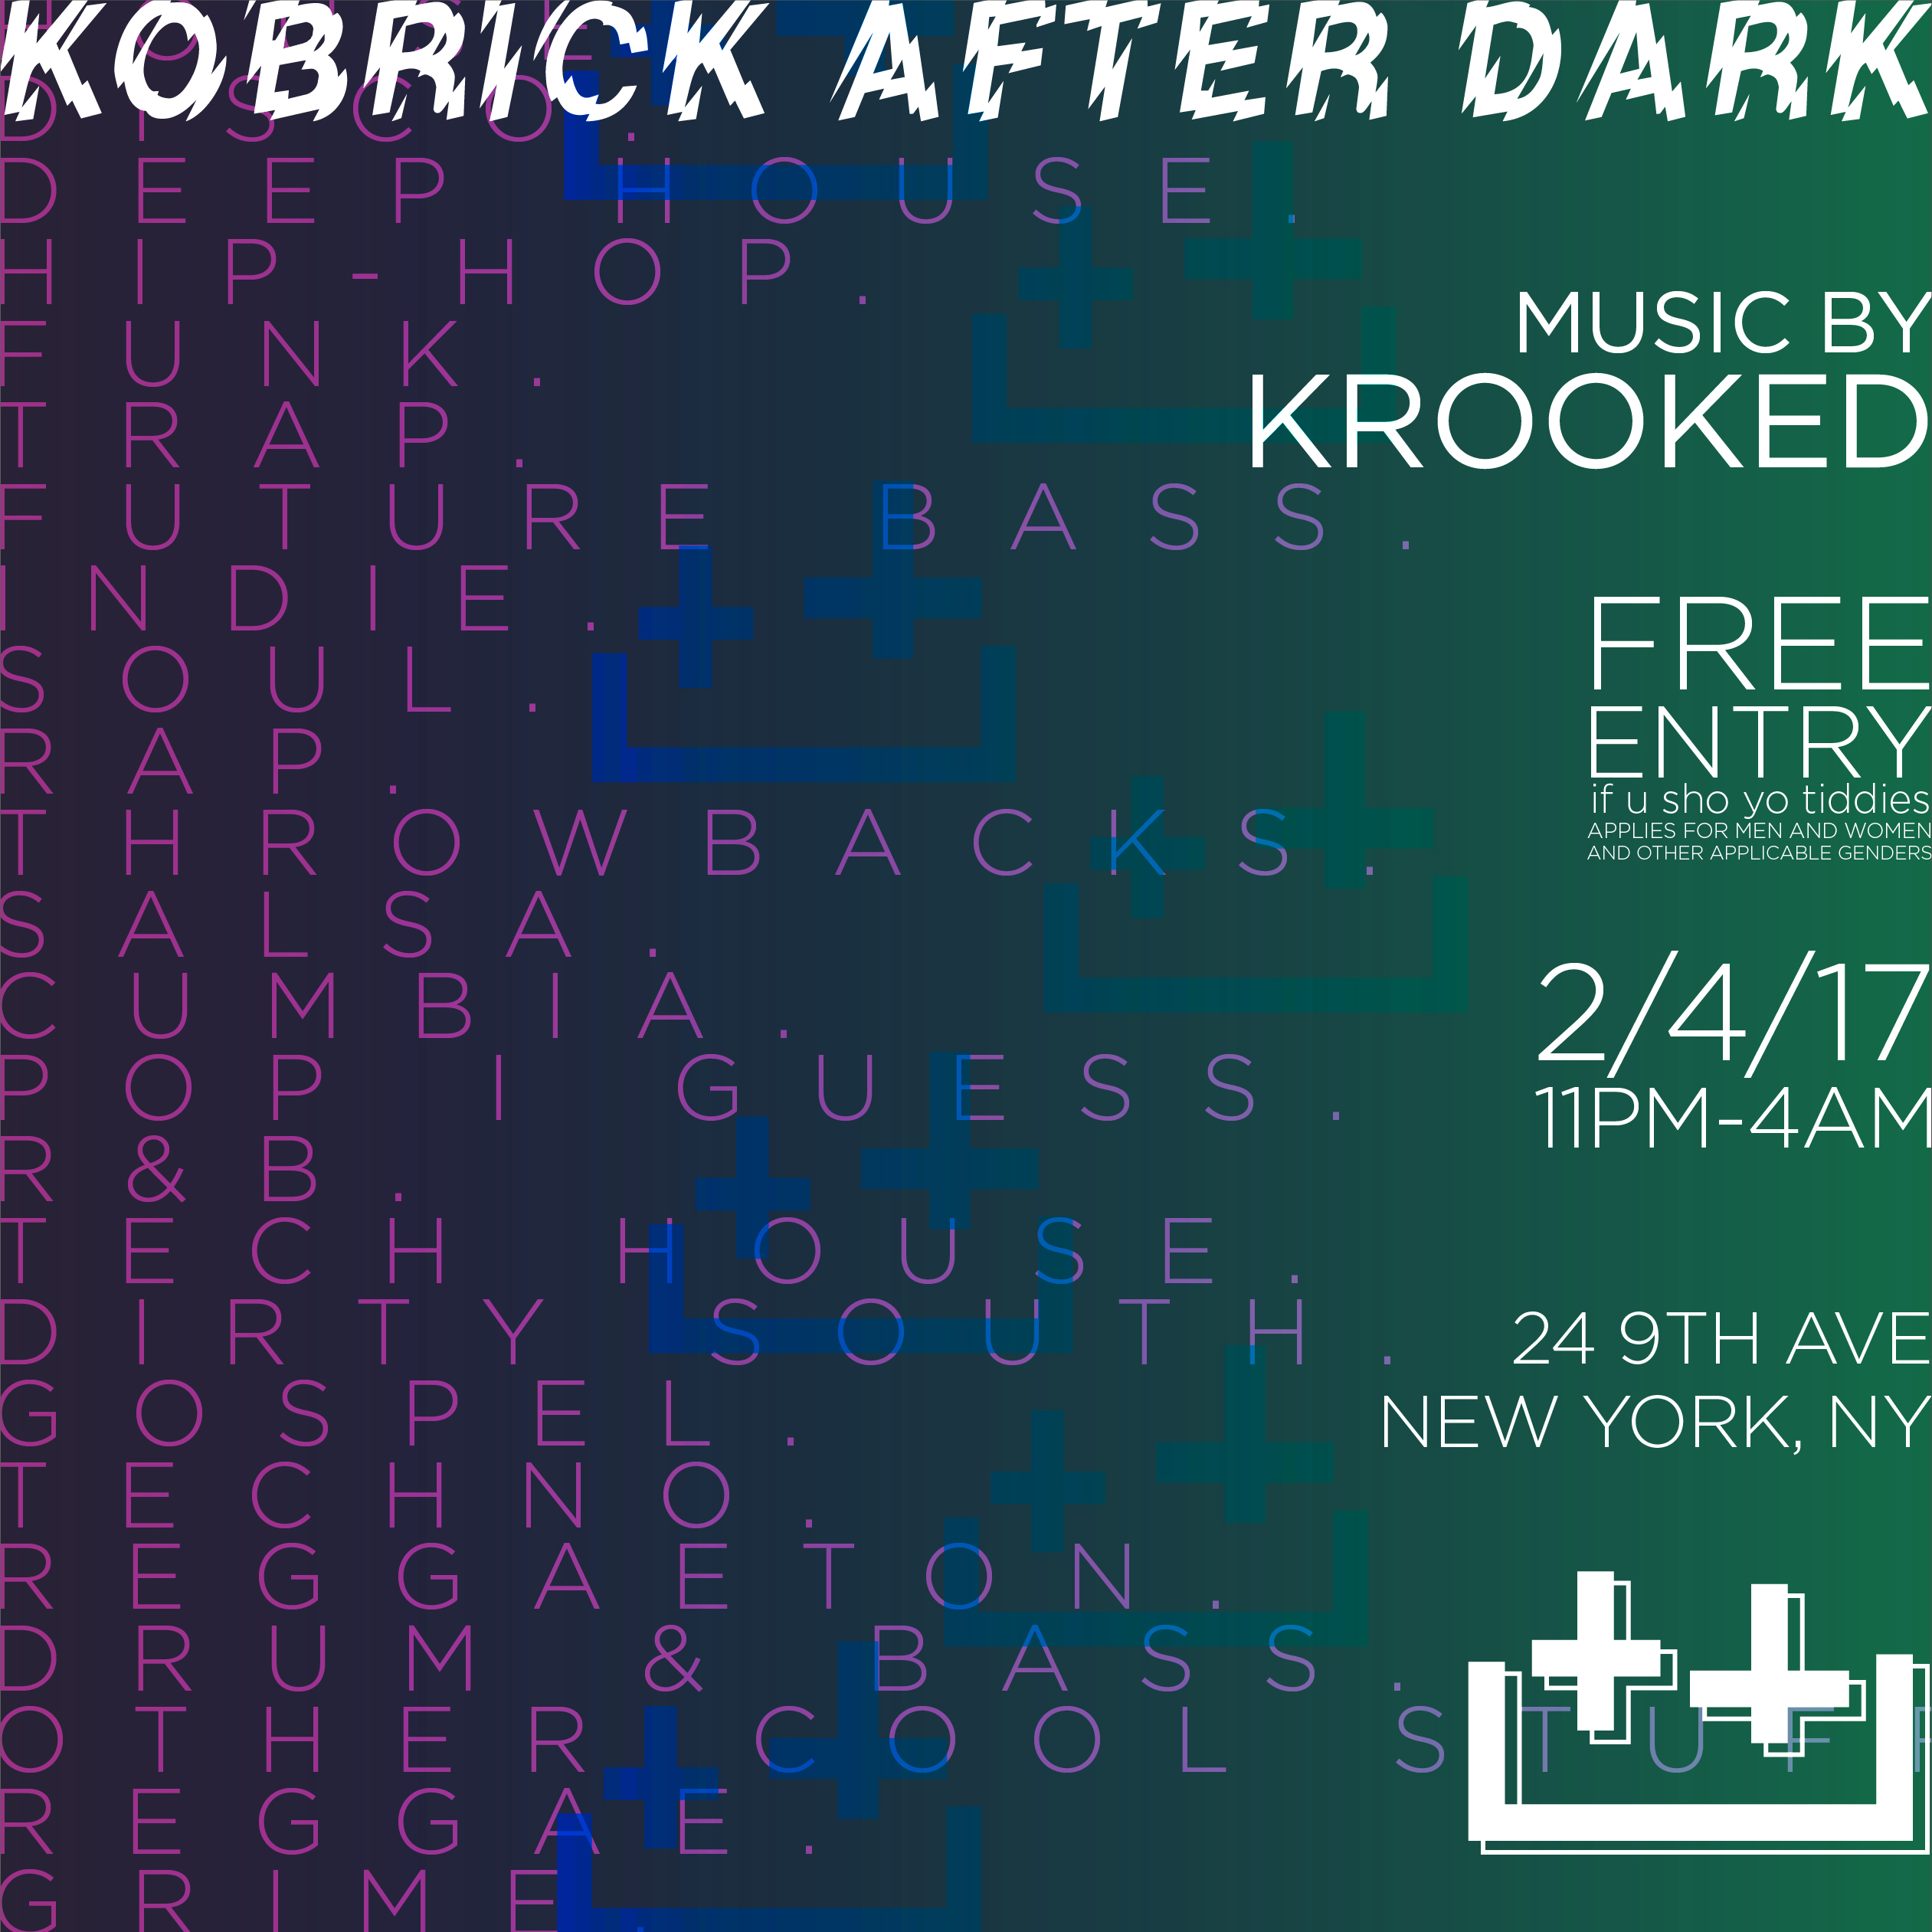 Kobrick promotion 17-01